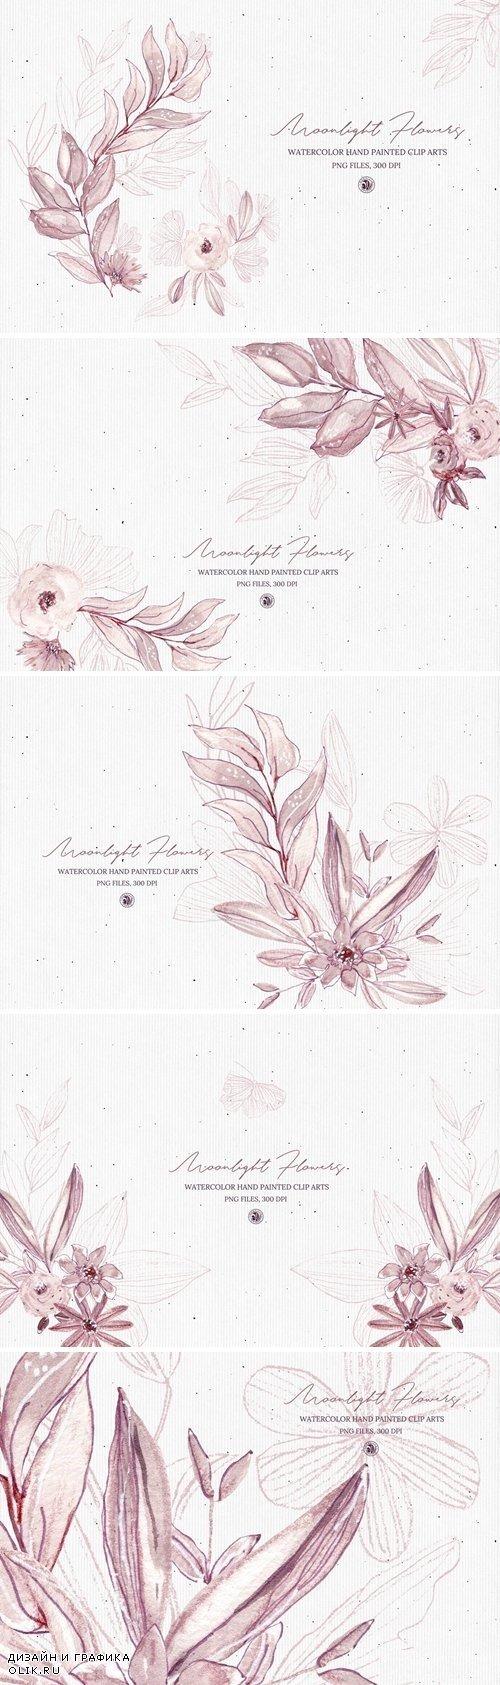 Moonlight Flowers - 4054330